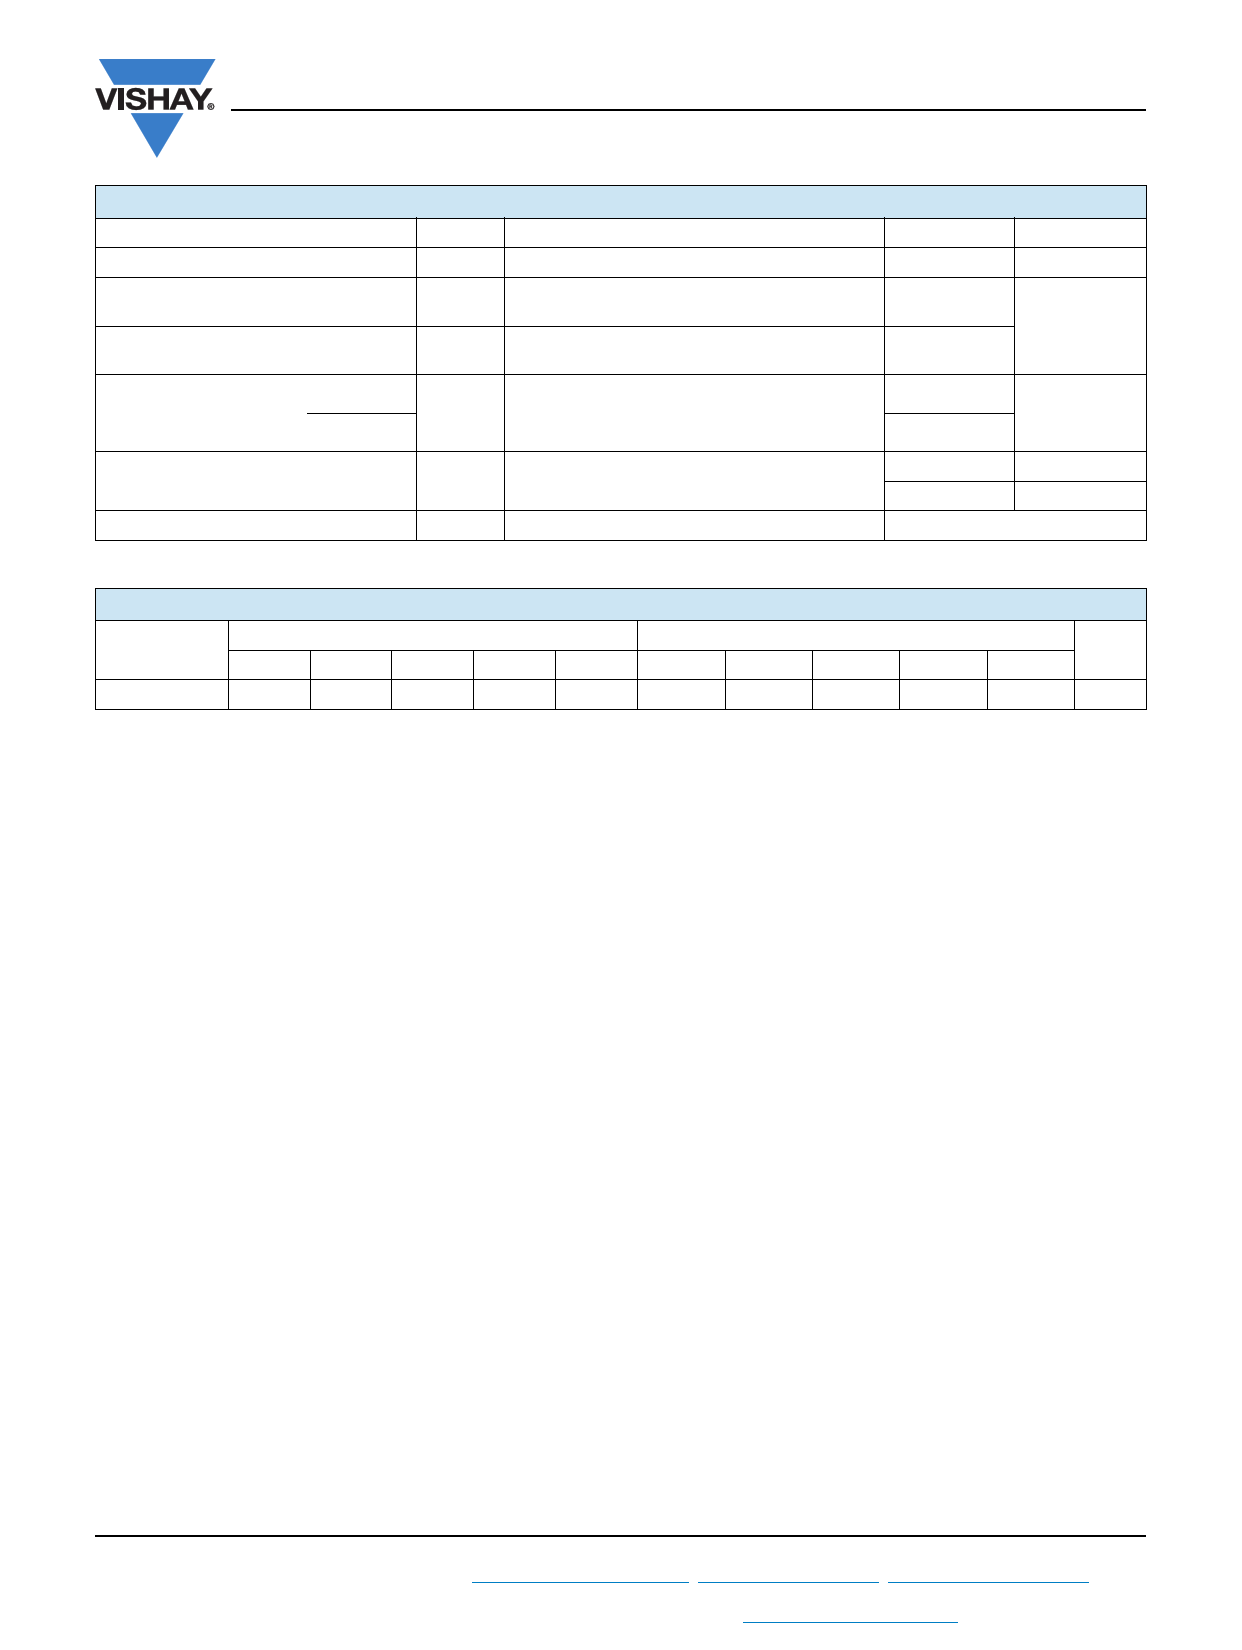 VSKD91-14P pdf, ピン配列